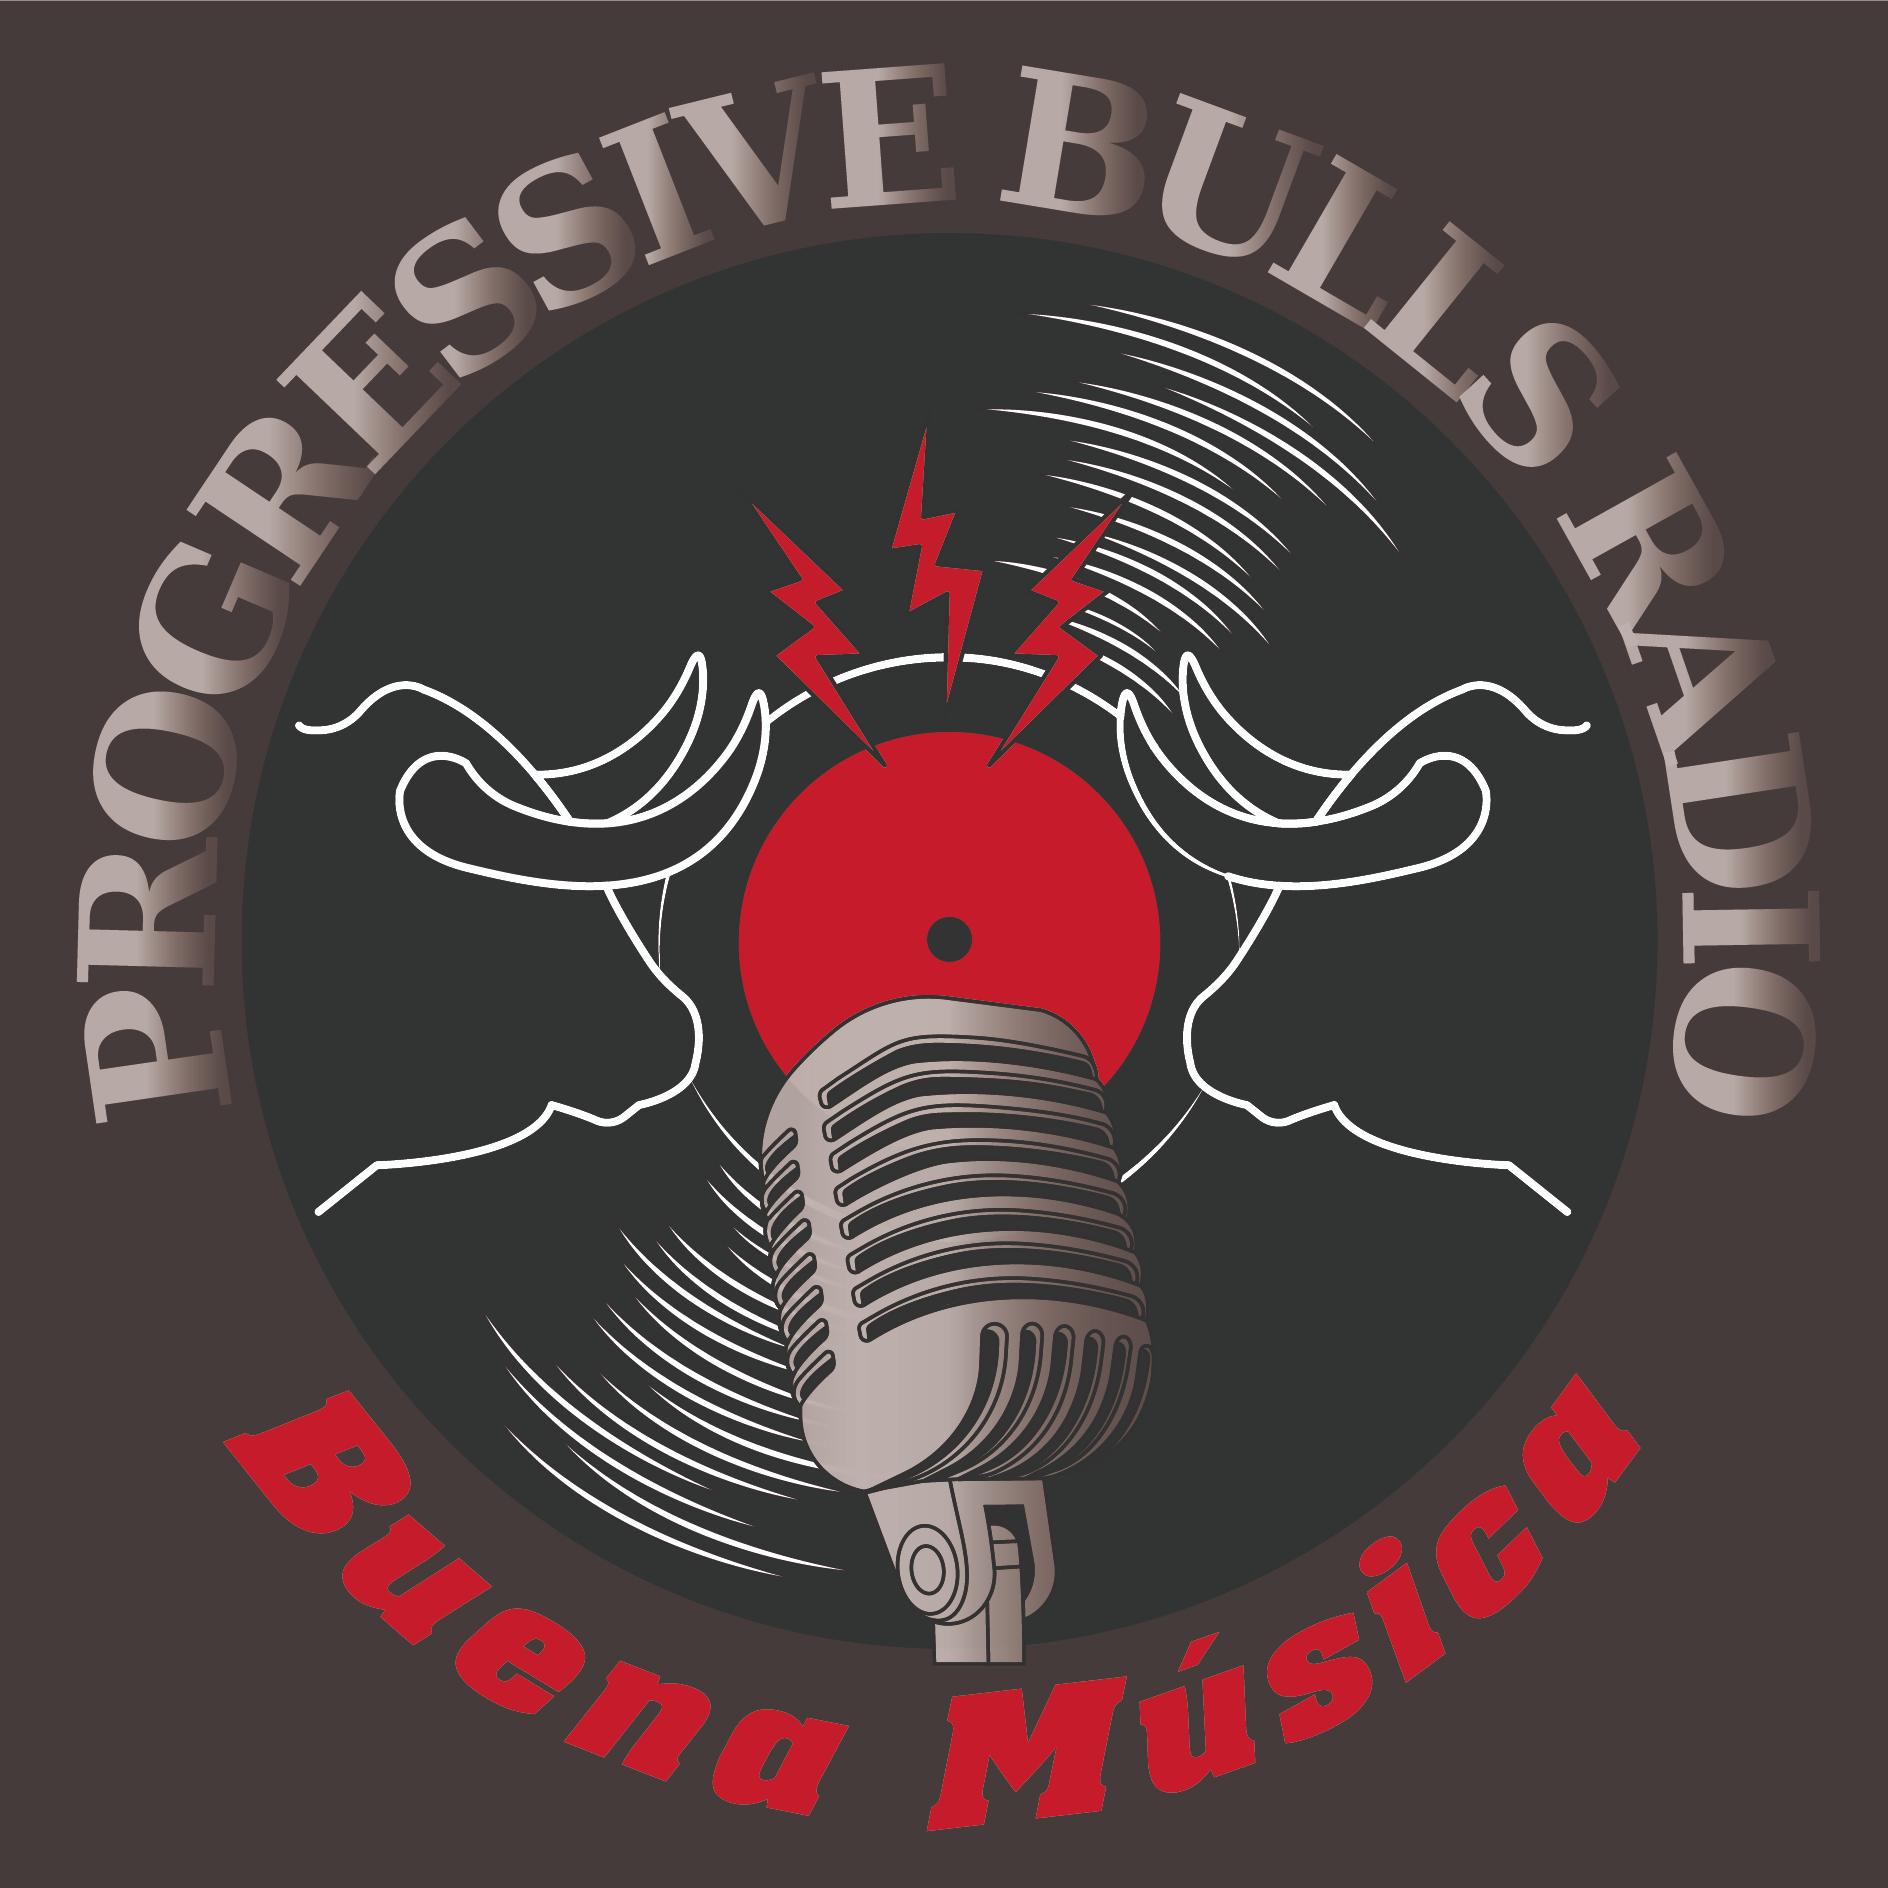 Progressive Bulls